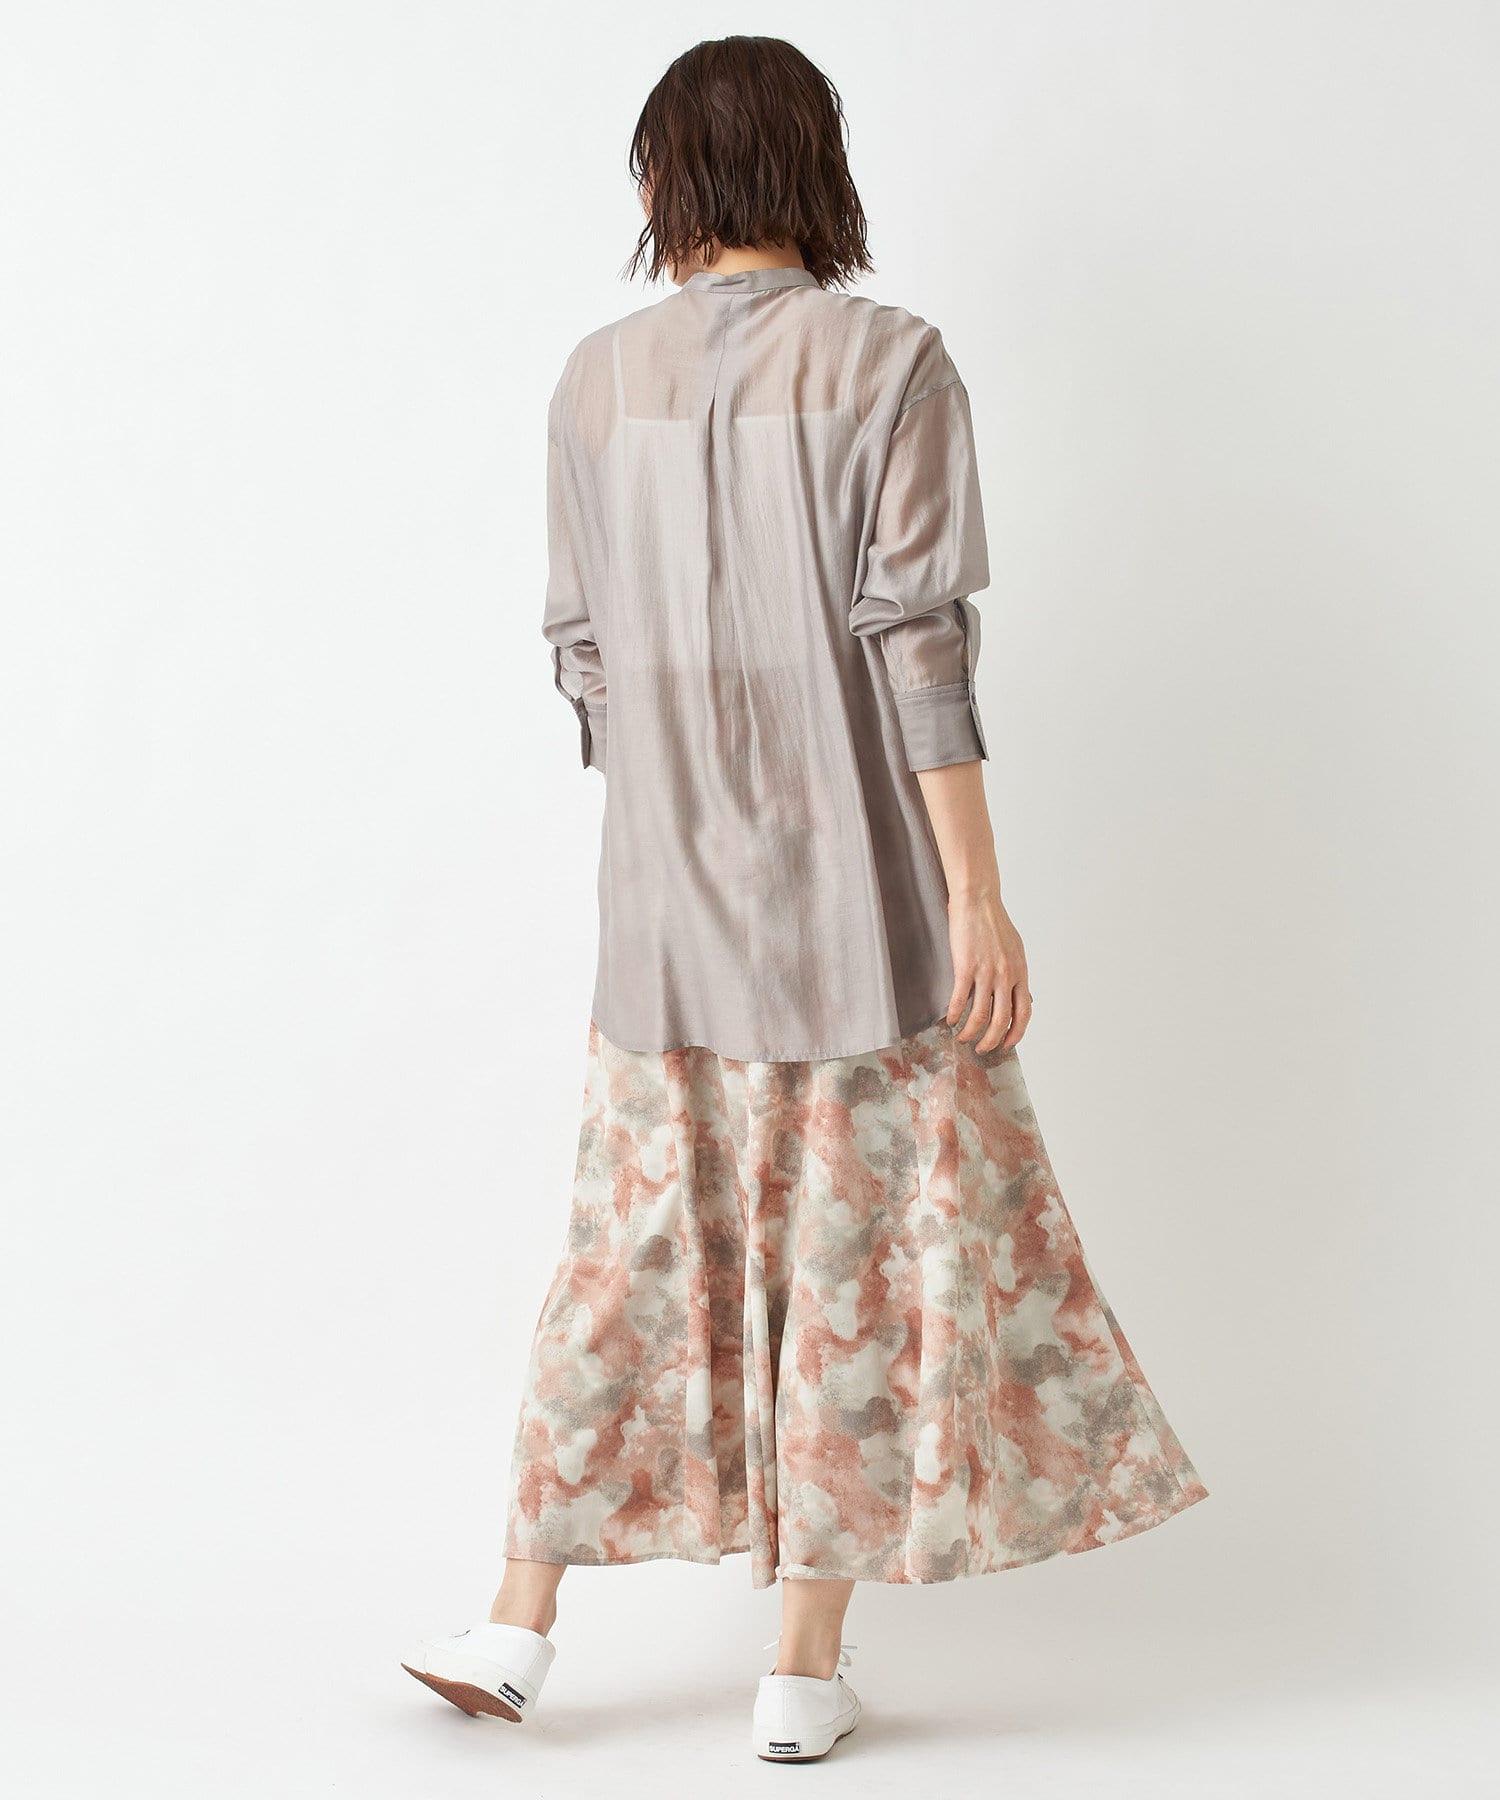 un dix cors(アンディコール) 【《大人フェミニンな印象に》手洗い可】ボカシプリントギャザースカート